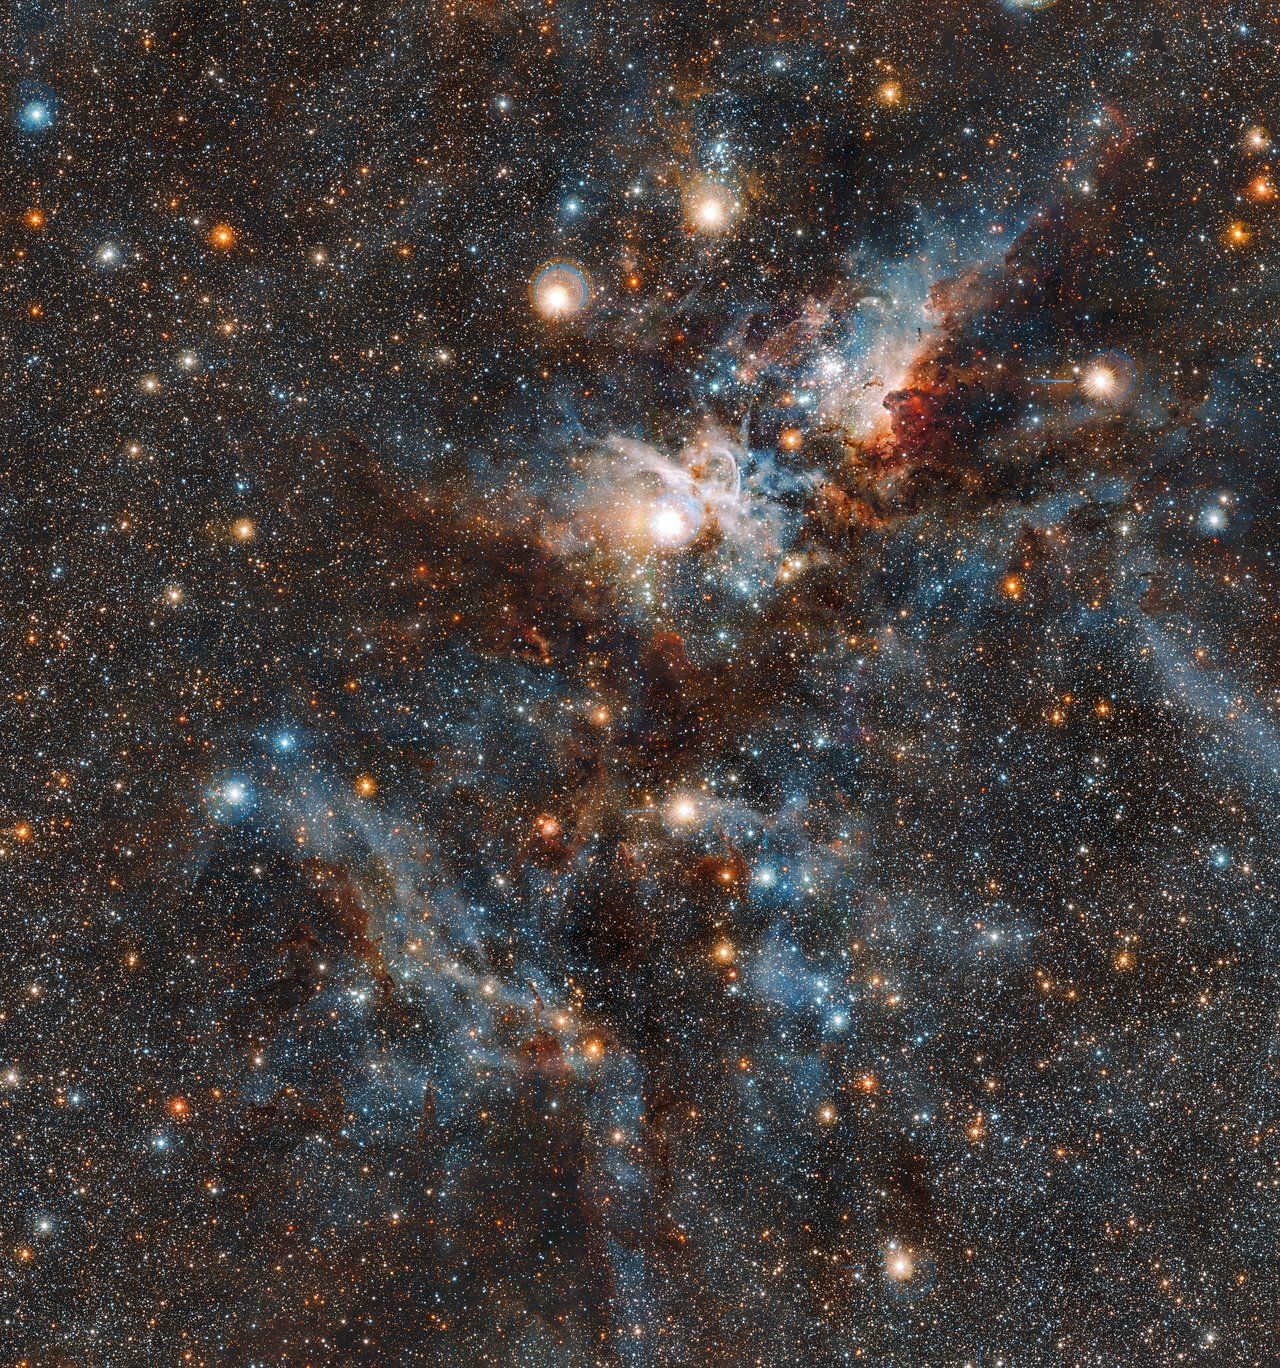 The Carina Nebula in infrared light